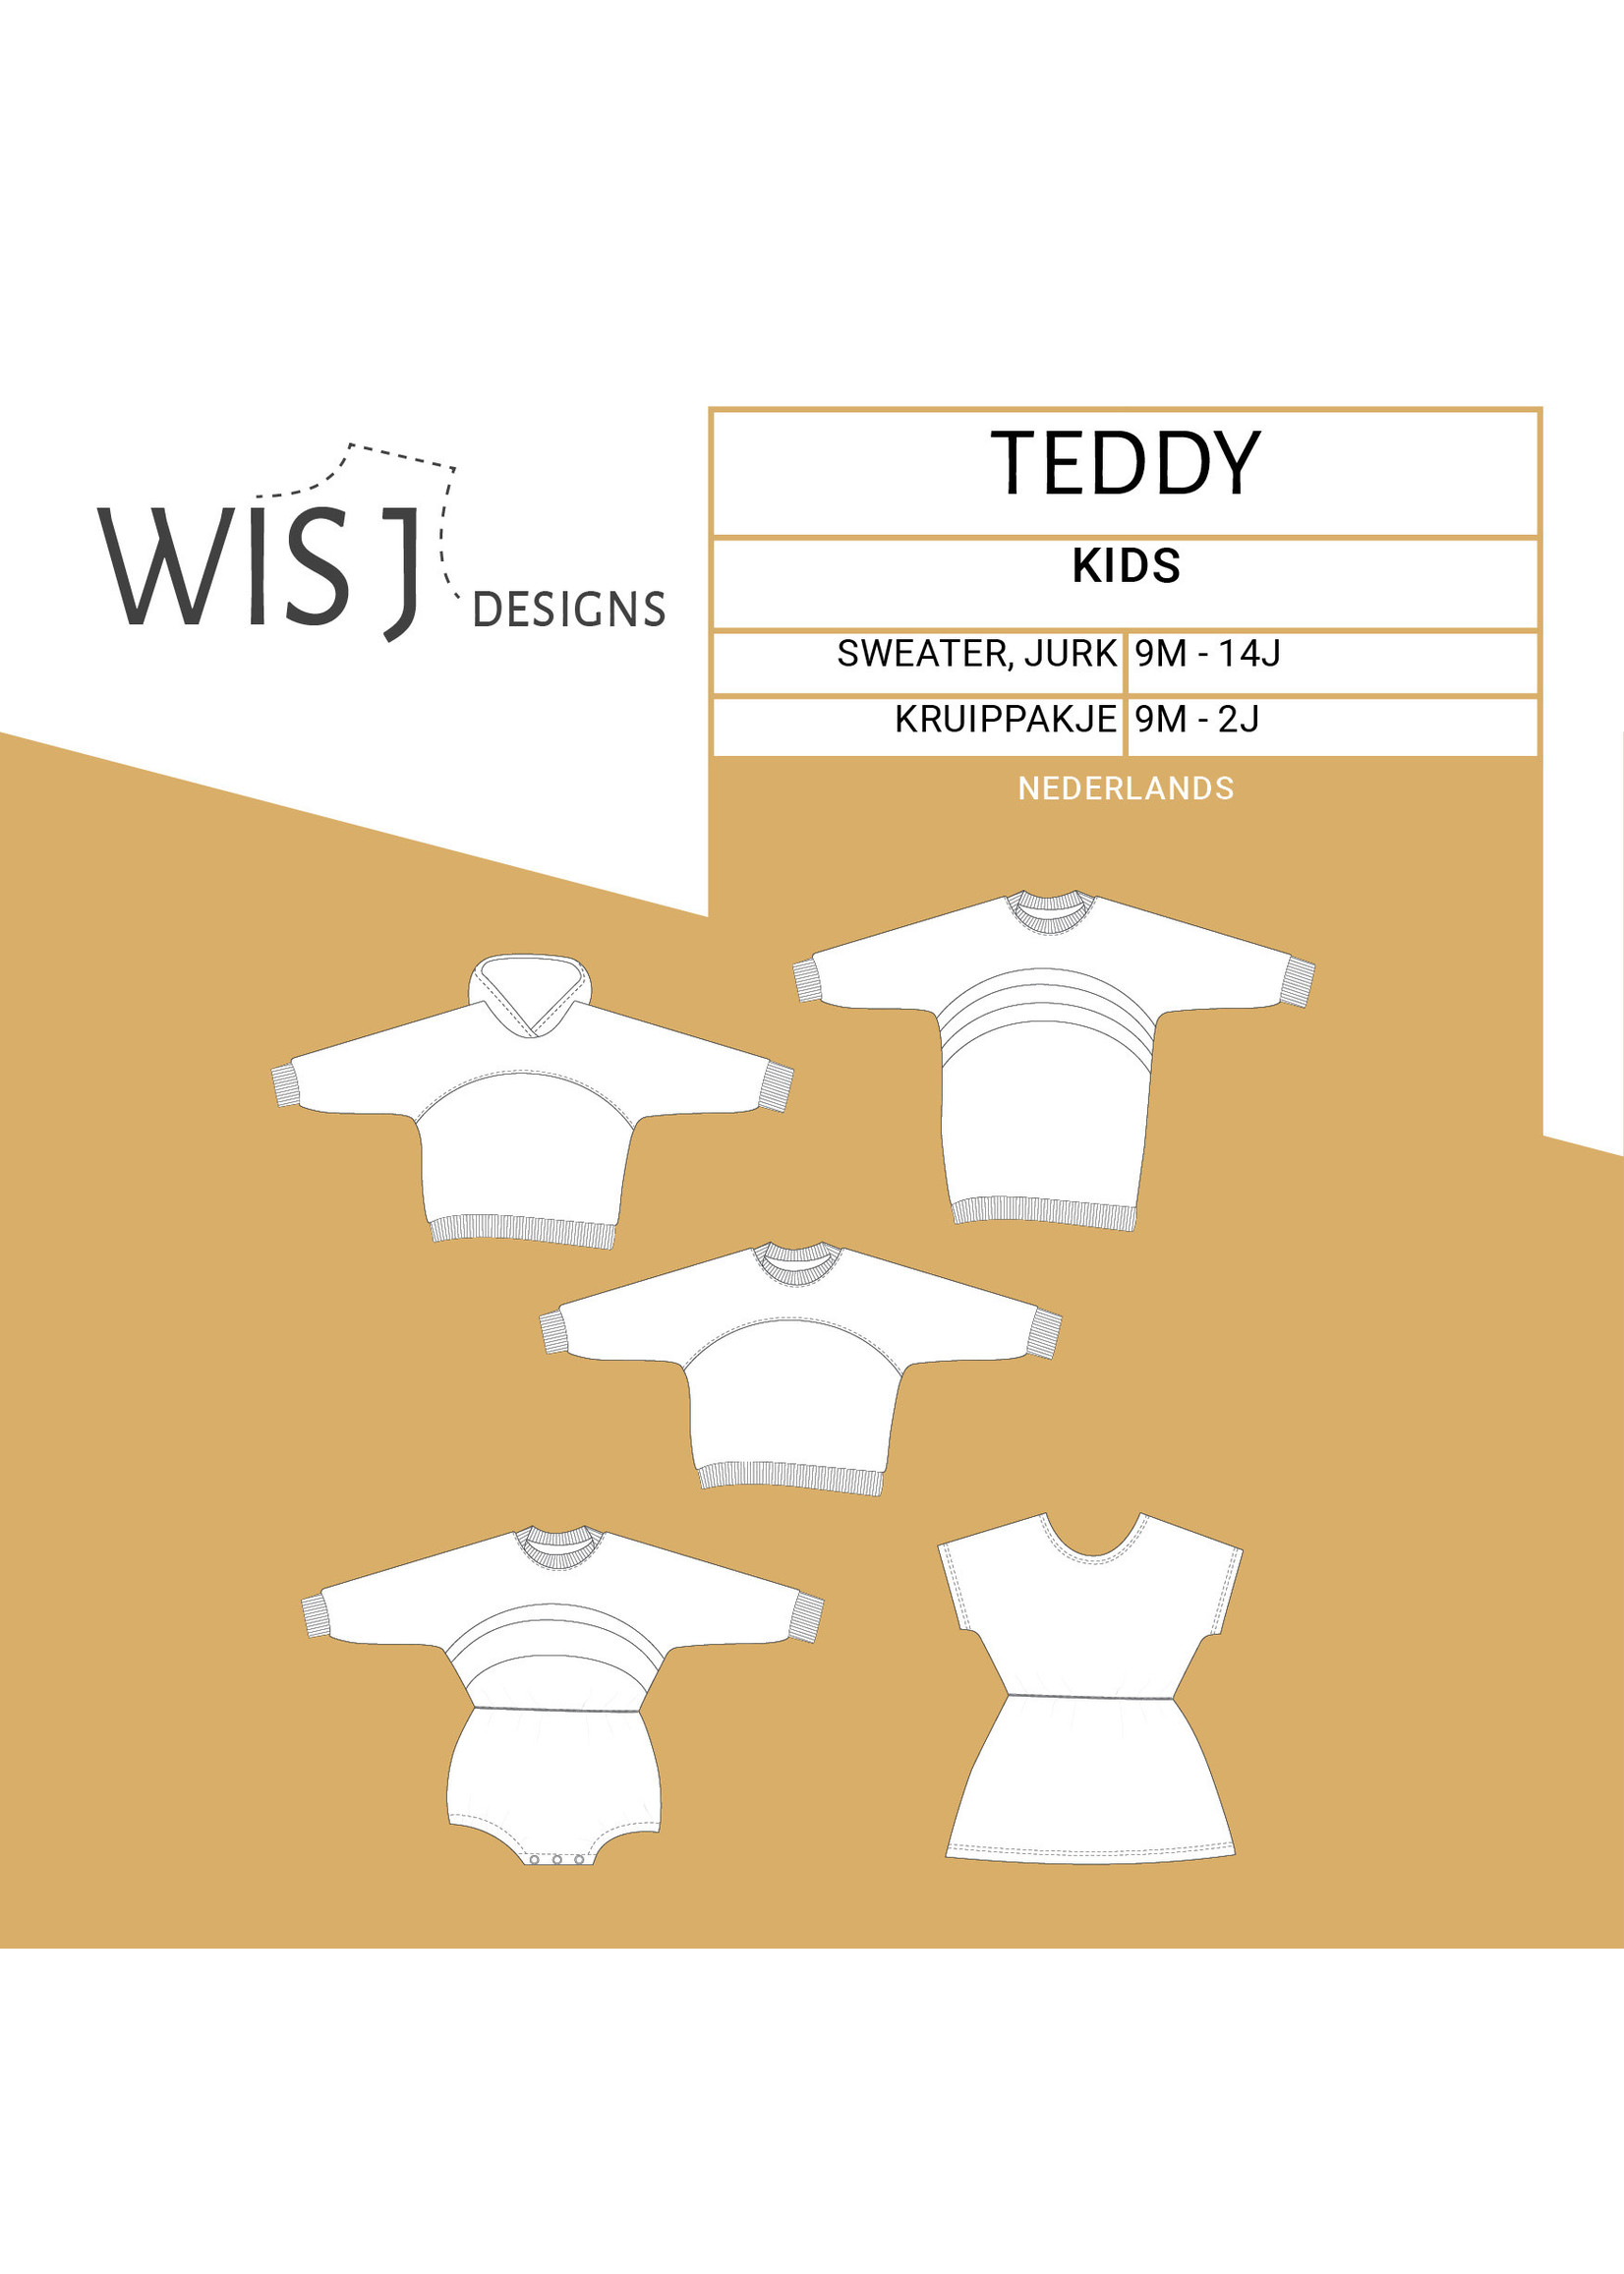 Wisj Designs Teddy wisj